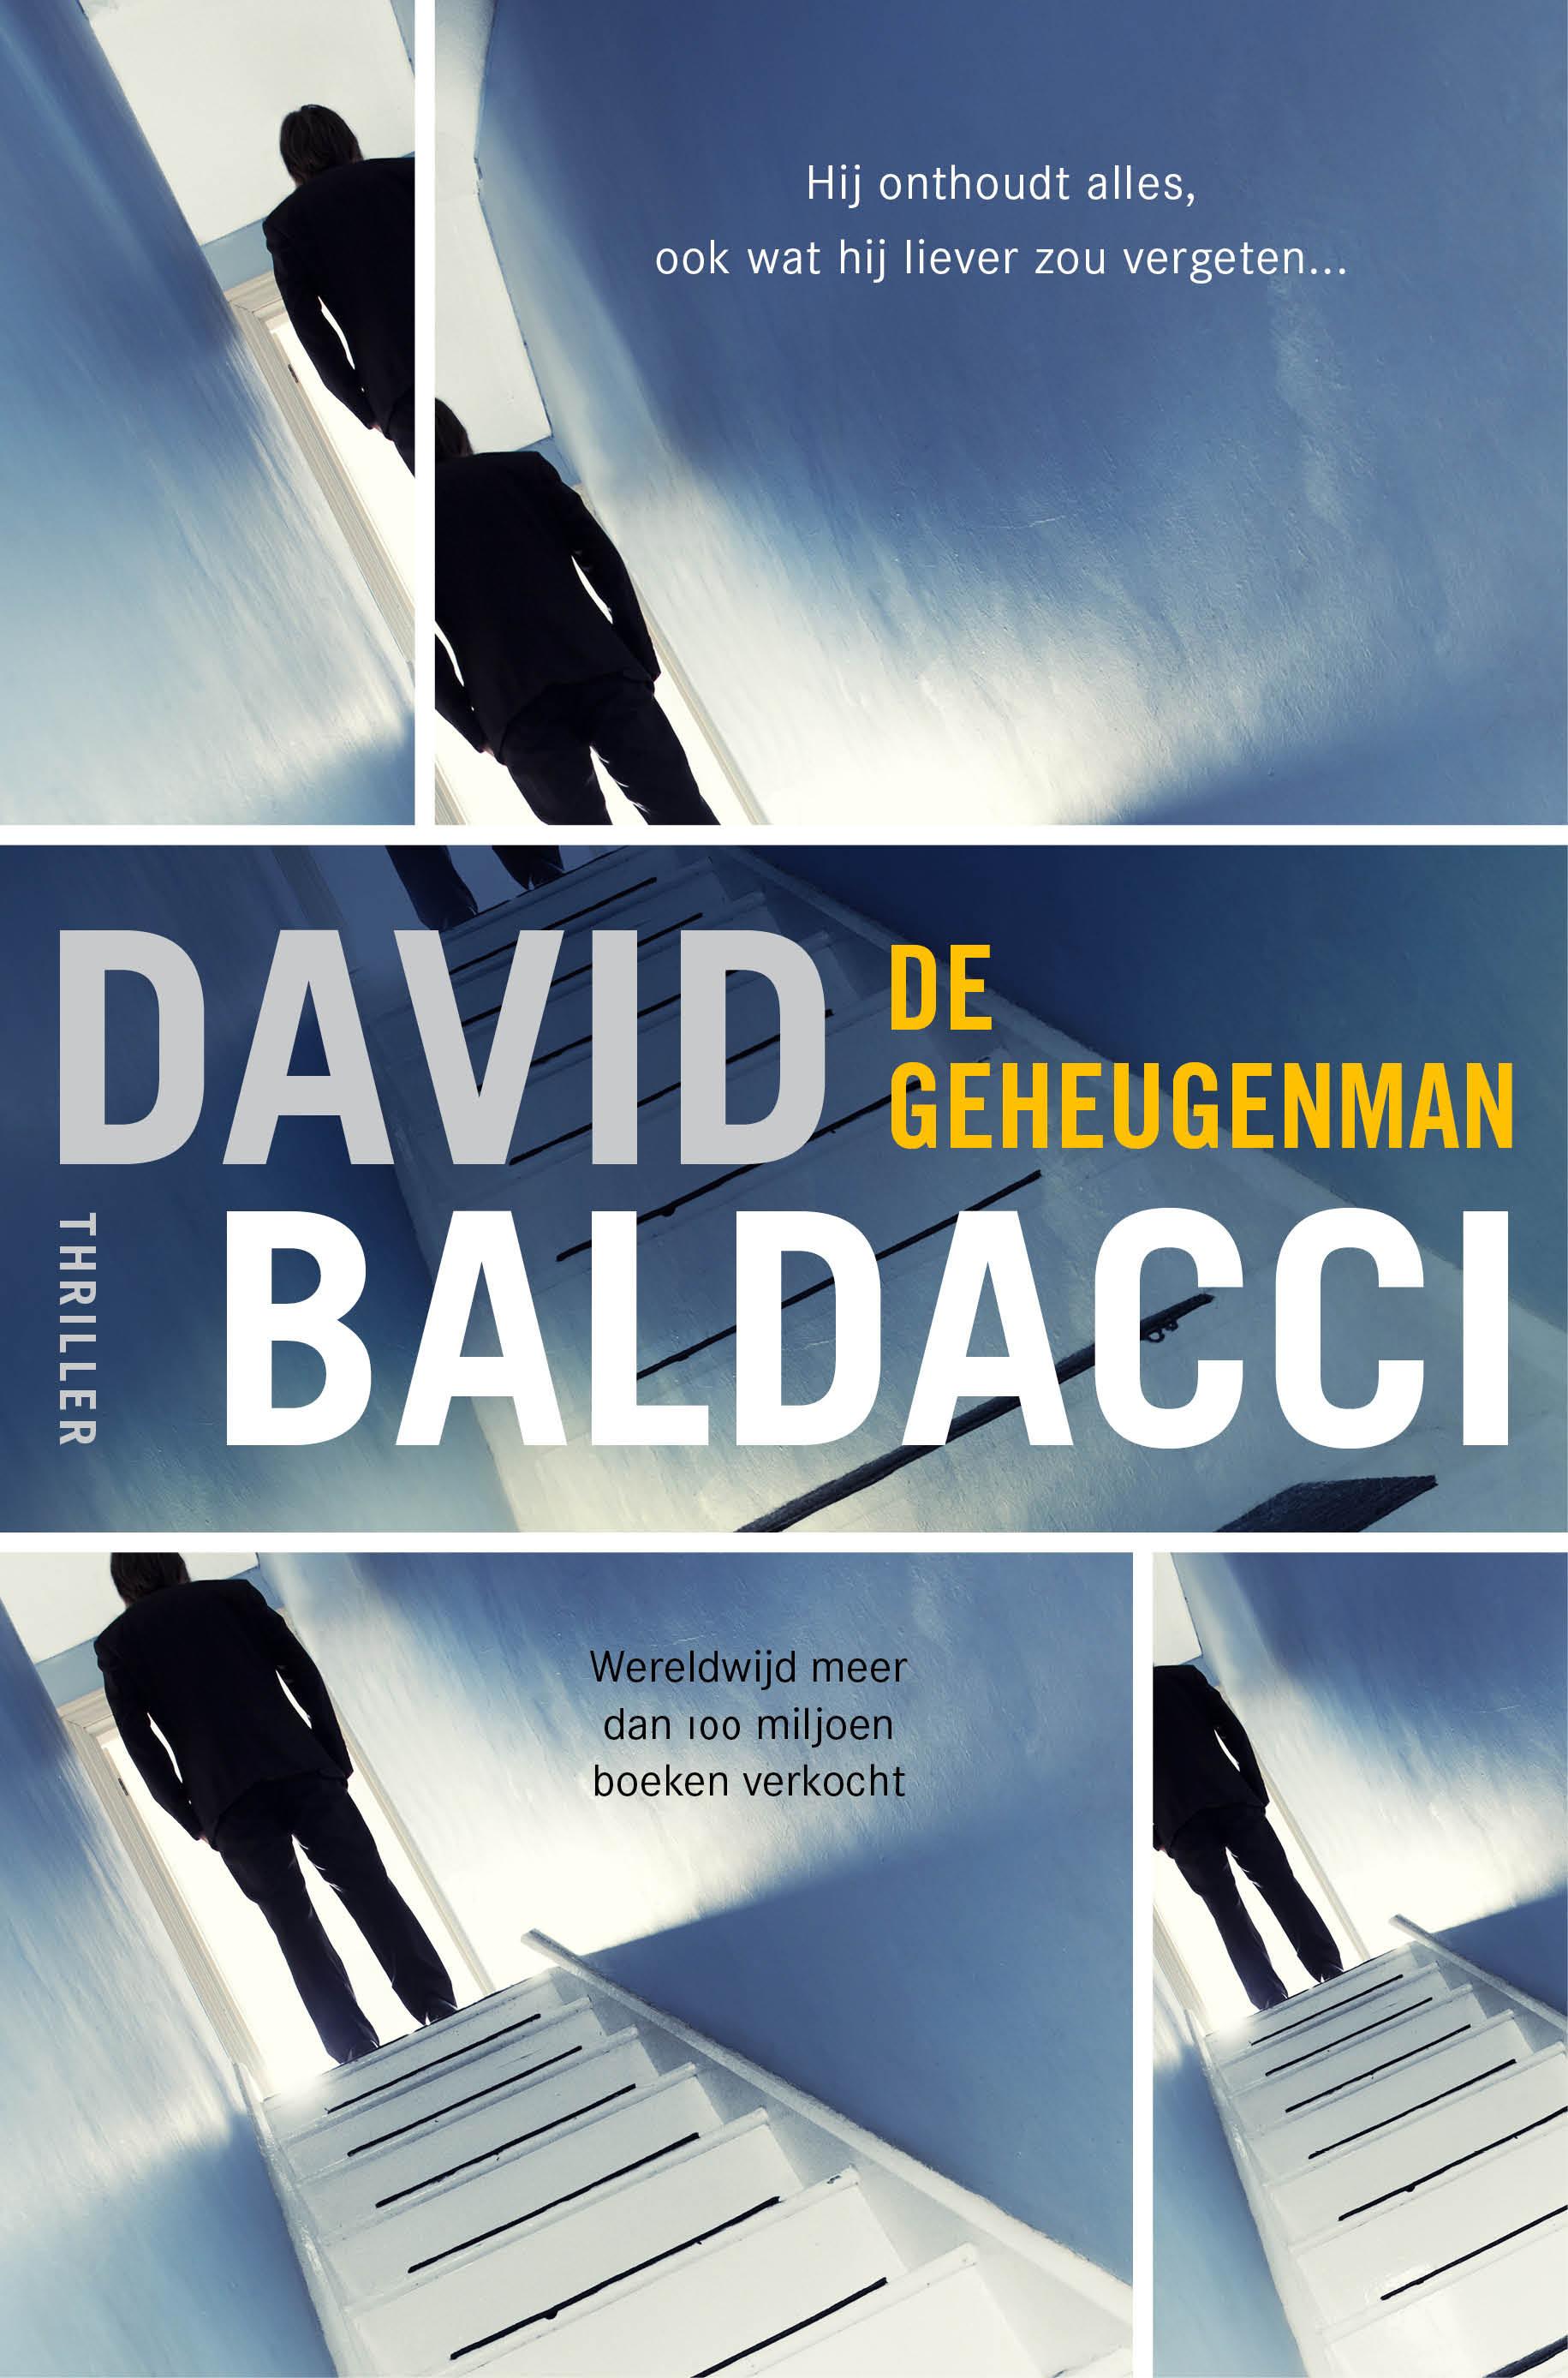 De geheugenman – David Baldacci